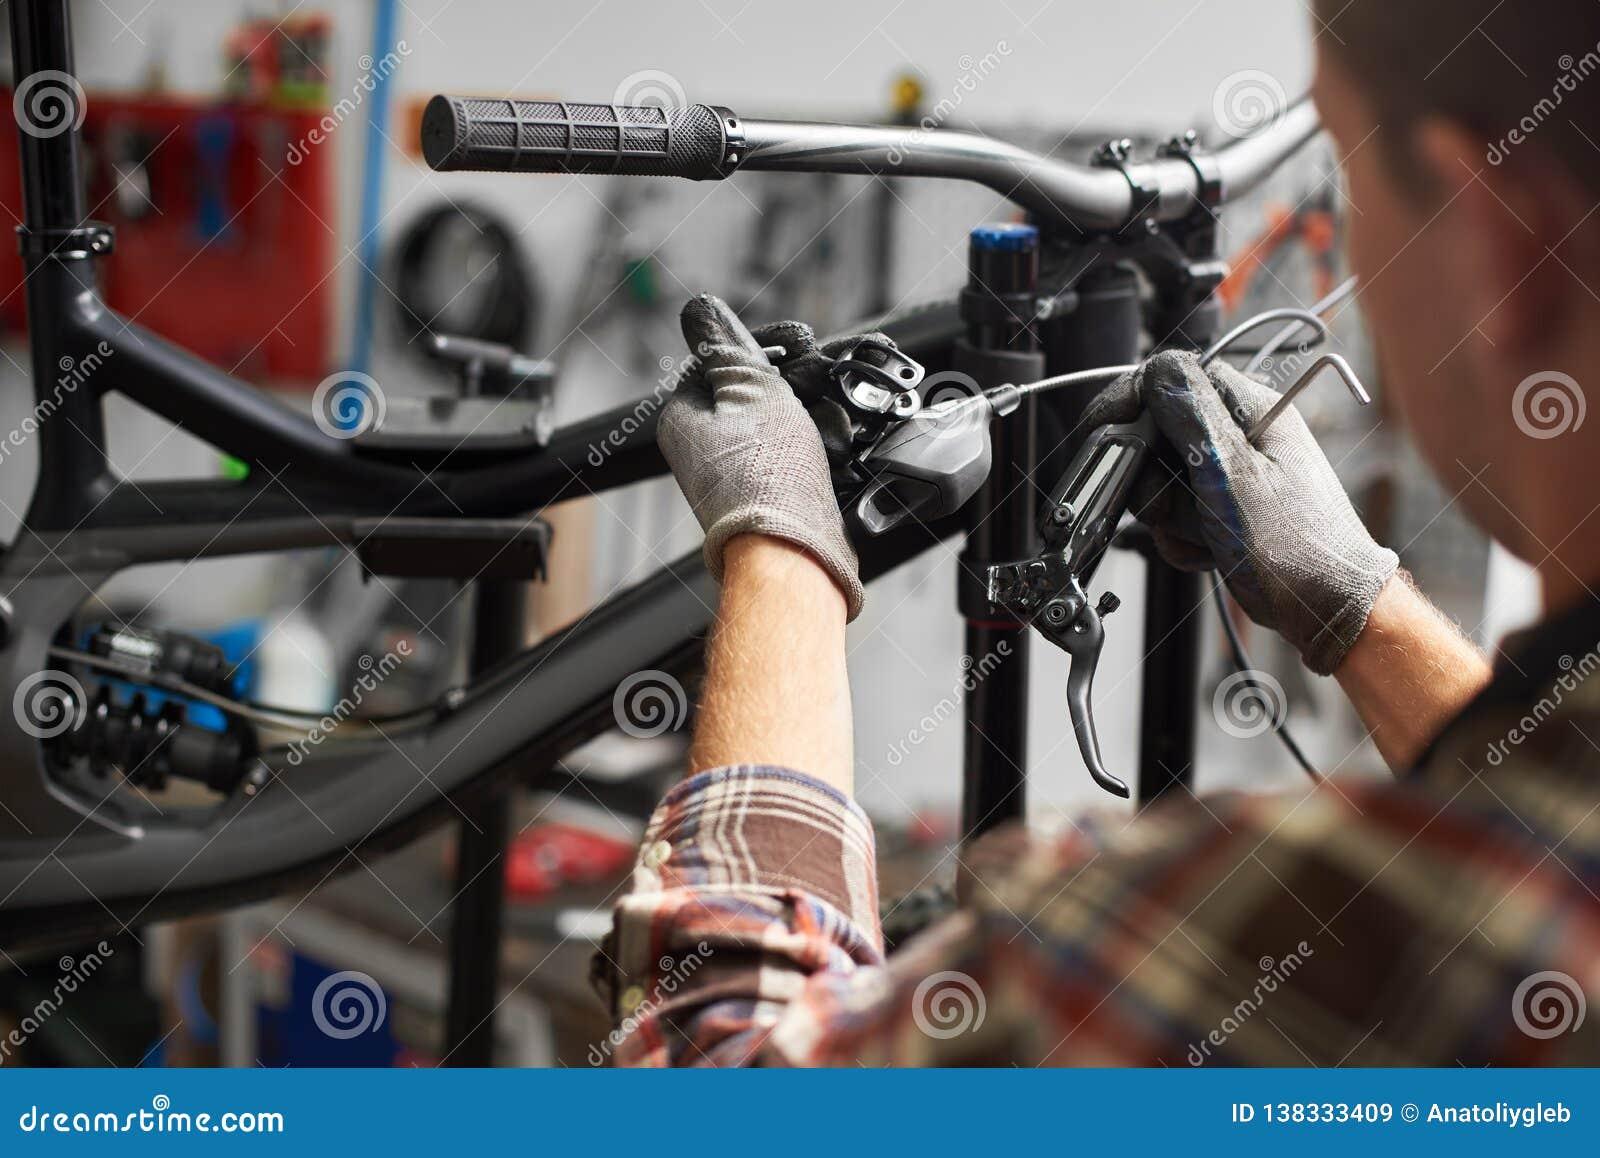 Male Mechanic Working In Bicycle Repair Shop Using Tools